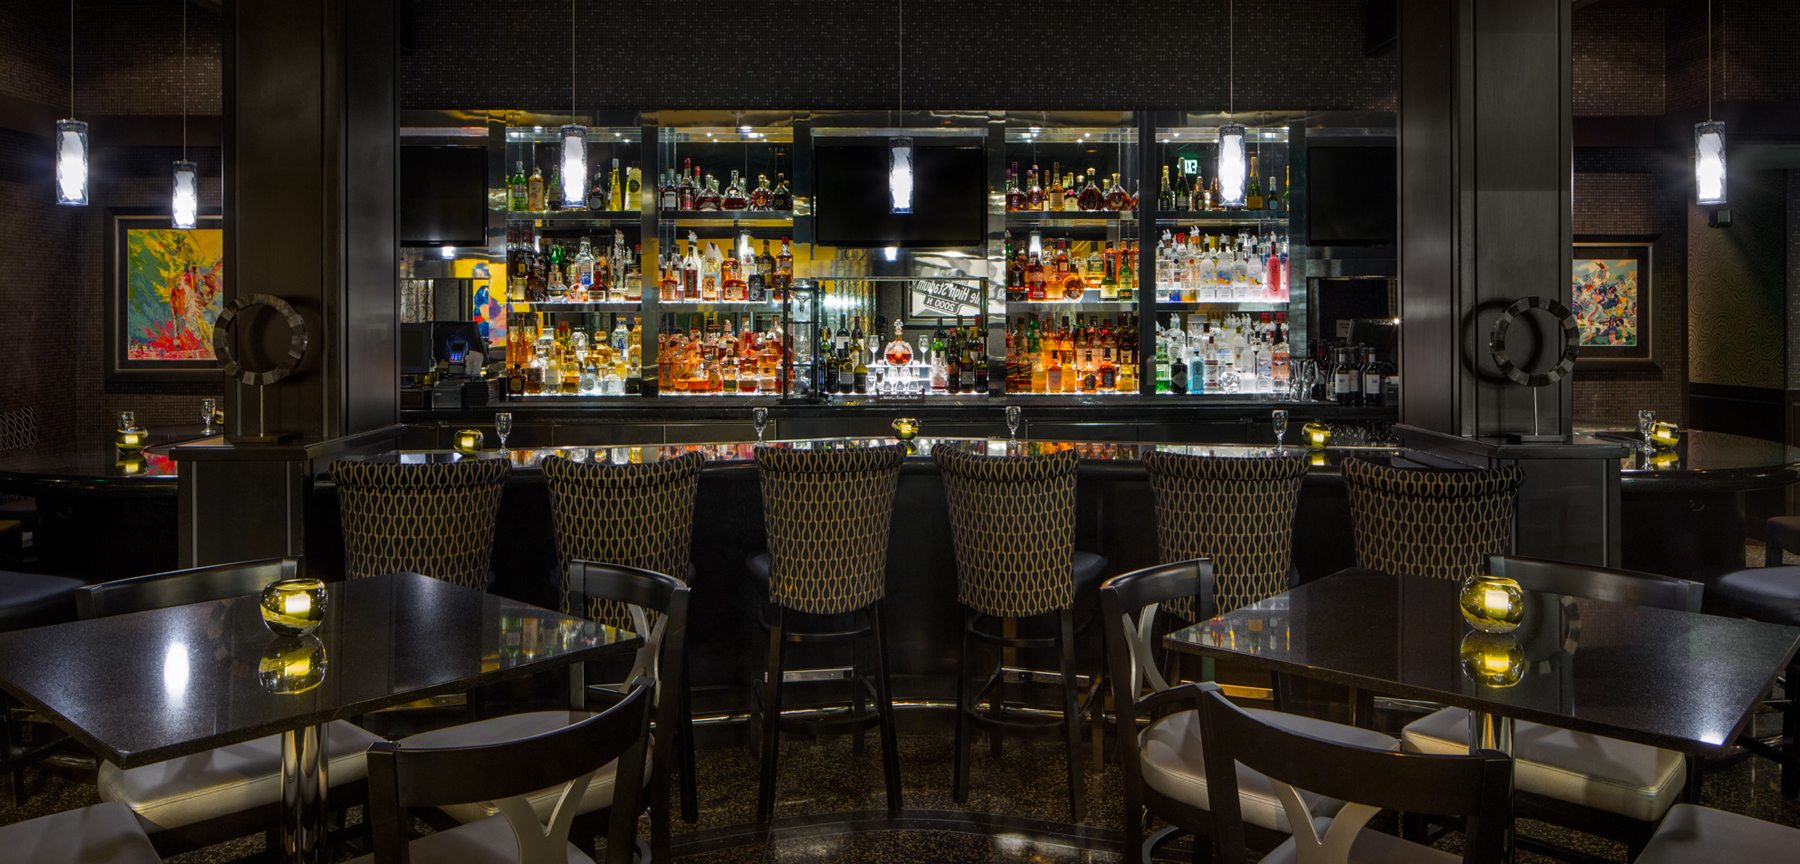 Morton's The Steakhouse in Denver - bar area